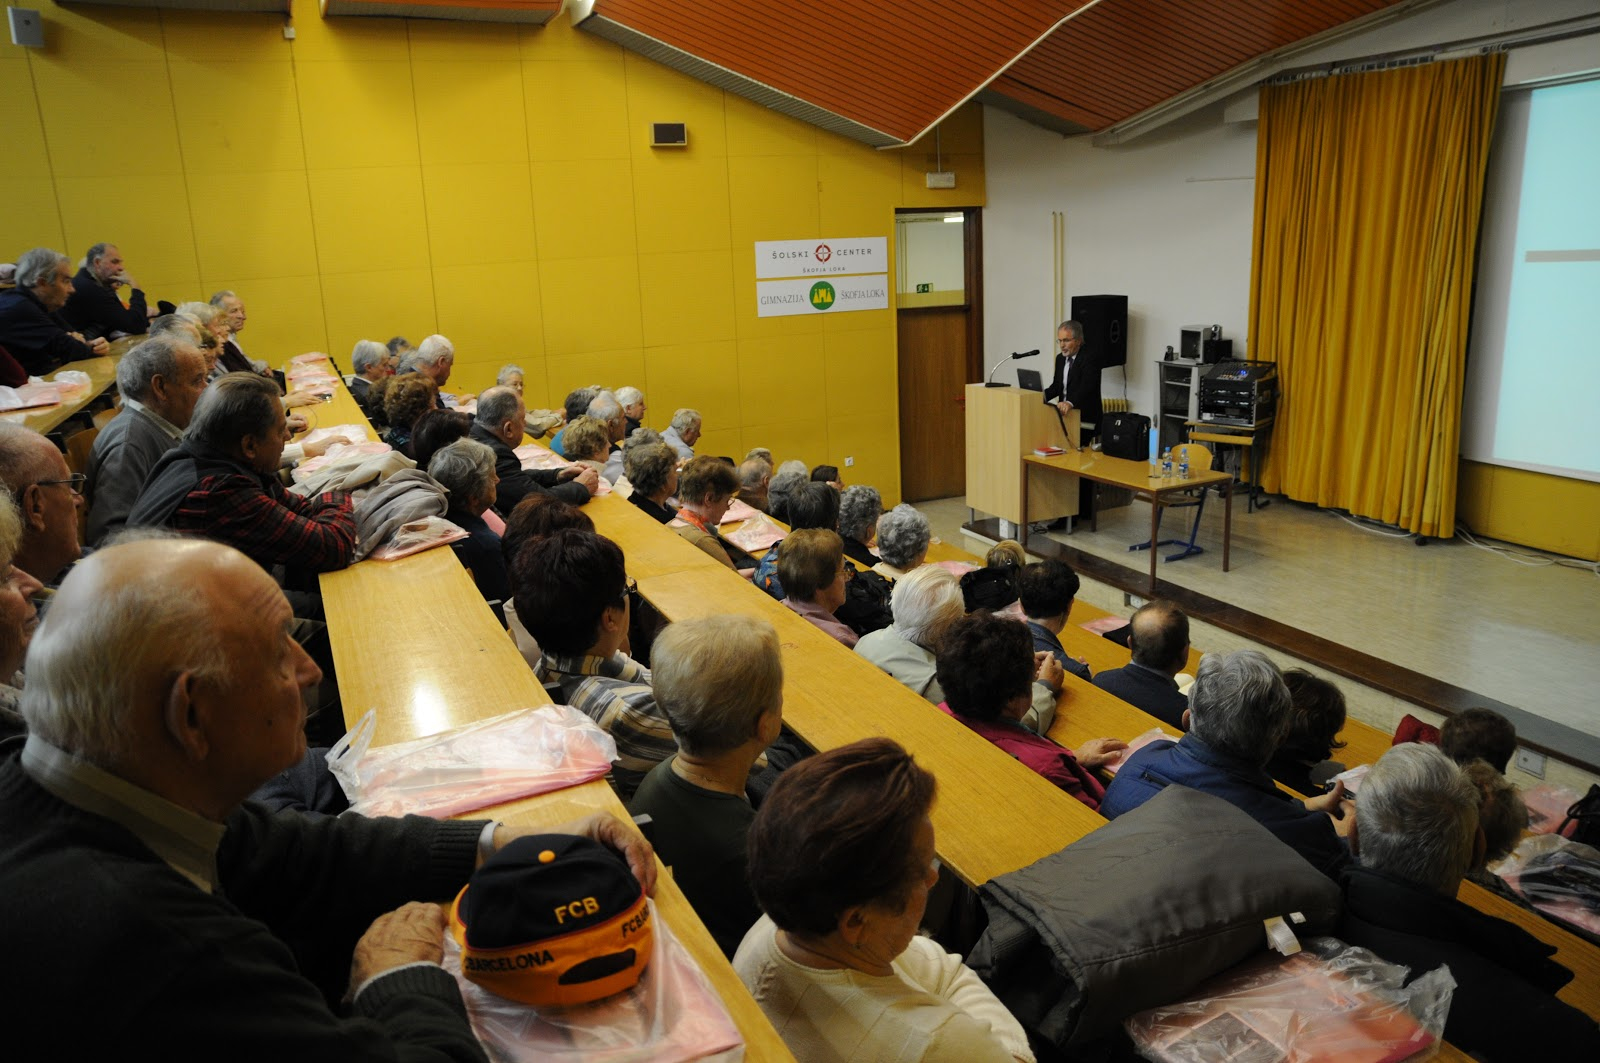 Predavanje, dr. Camlek - oktober 2011 - DSC_3864.JPG